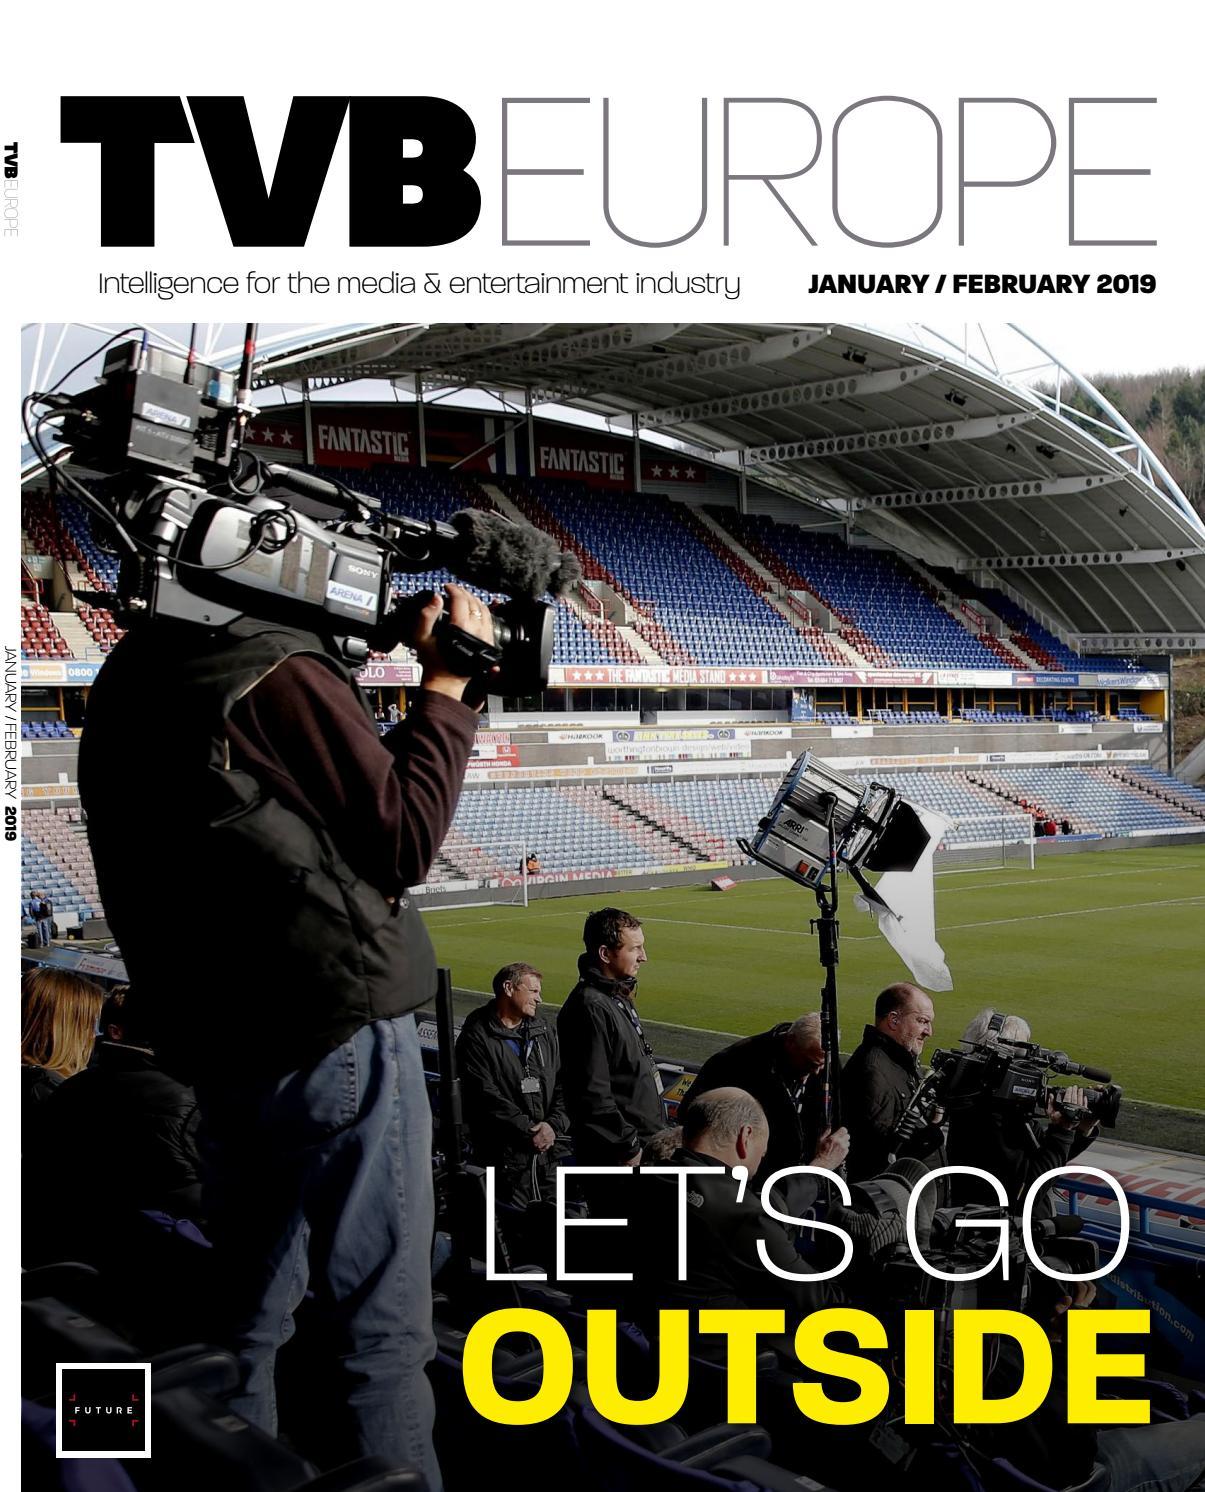 TVB Europe January / February 2019 by Future PLC - issuu